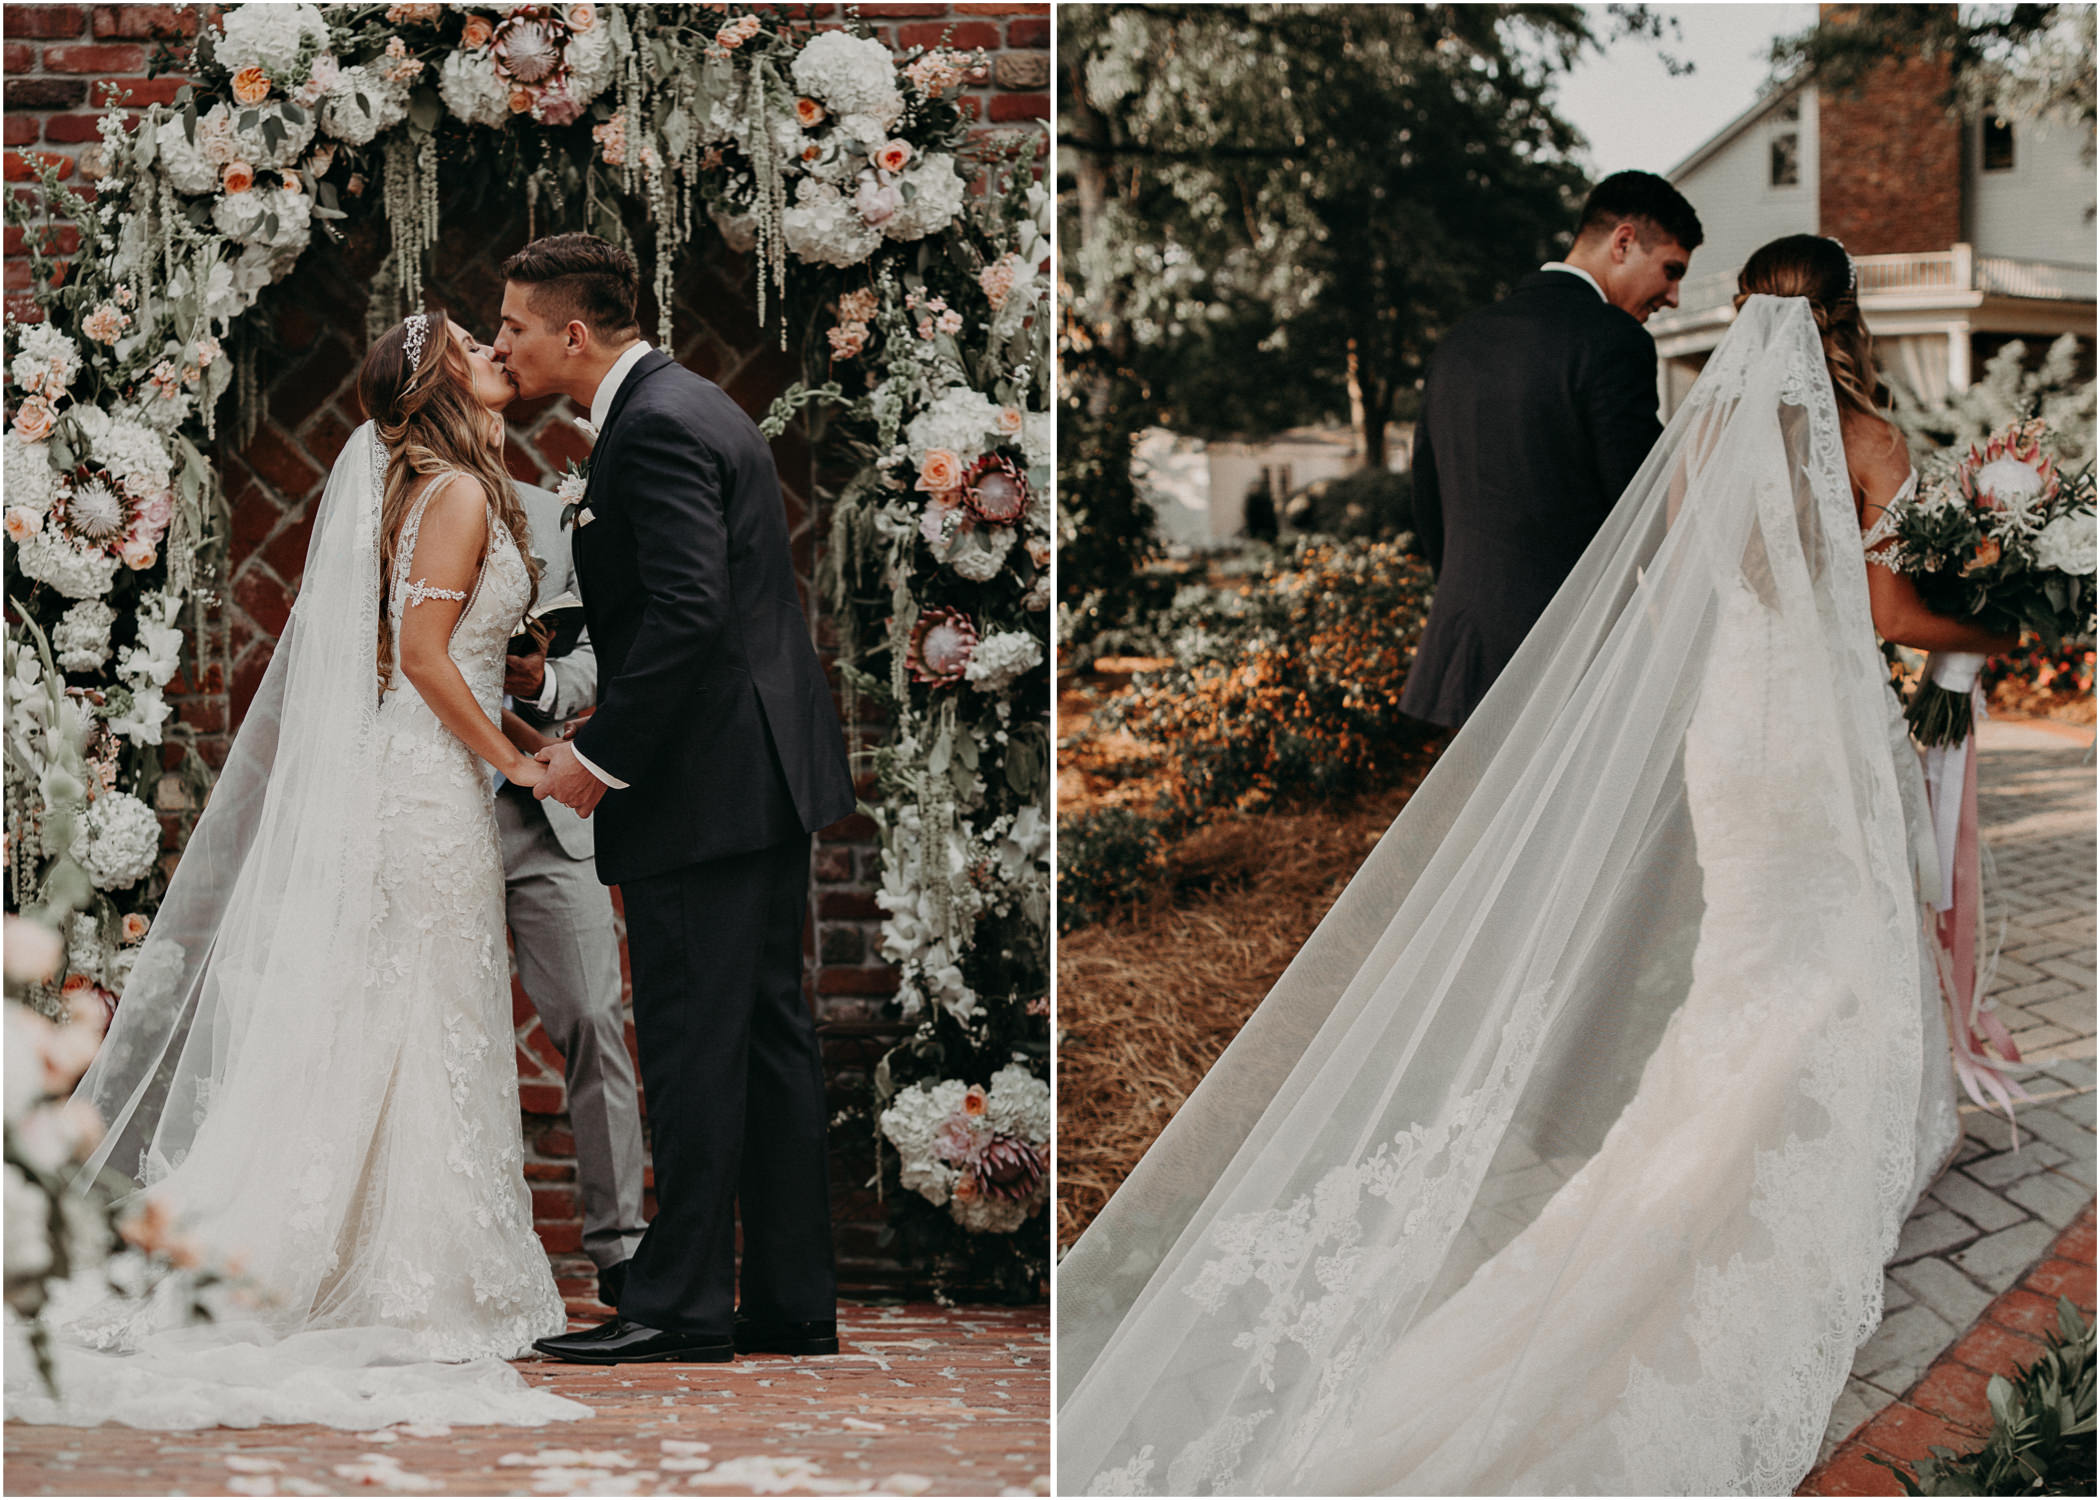 73Carl House Wedding Venue Ga, Atlanta Wedding Photographer - Boho, Bohemian, Junebug Weddings, Vintage, Retro, Trendy. Aline Marin Photography. .jpg